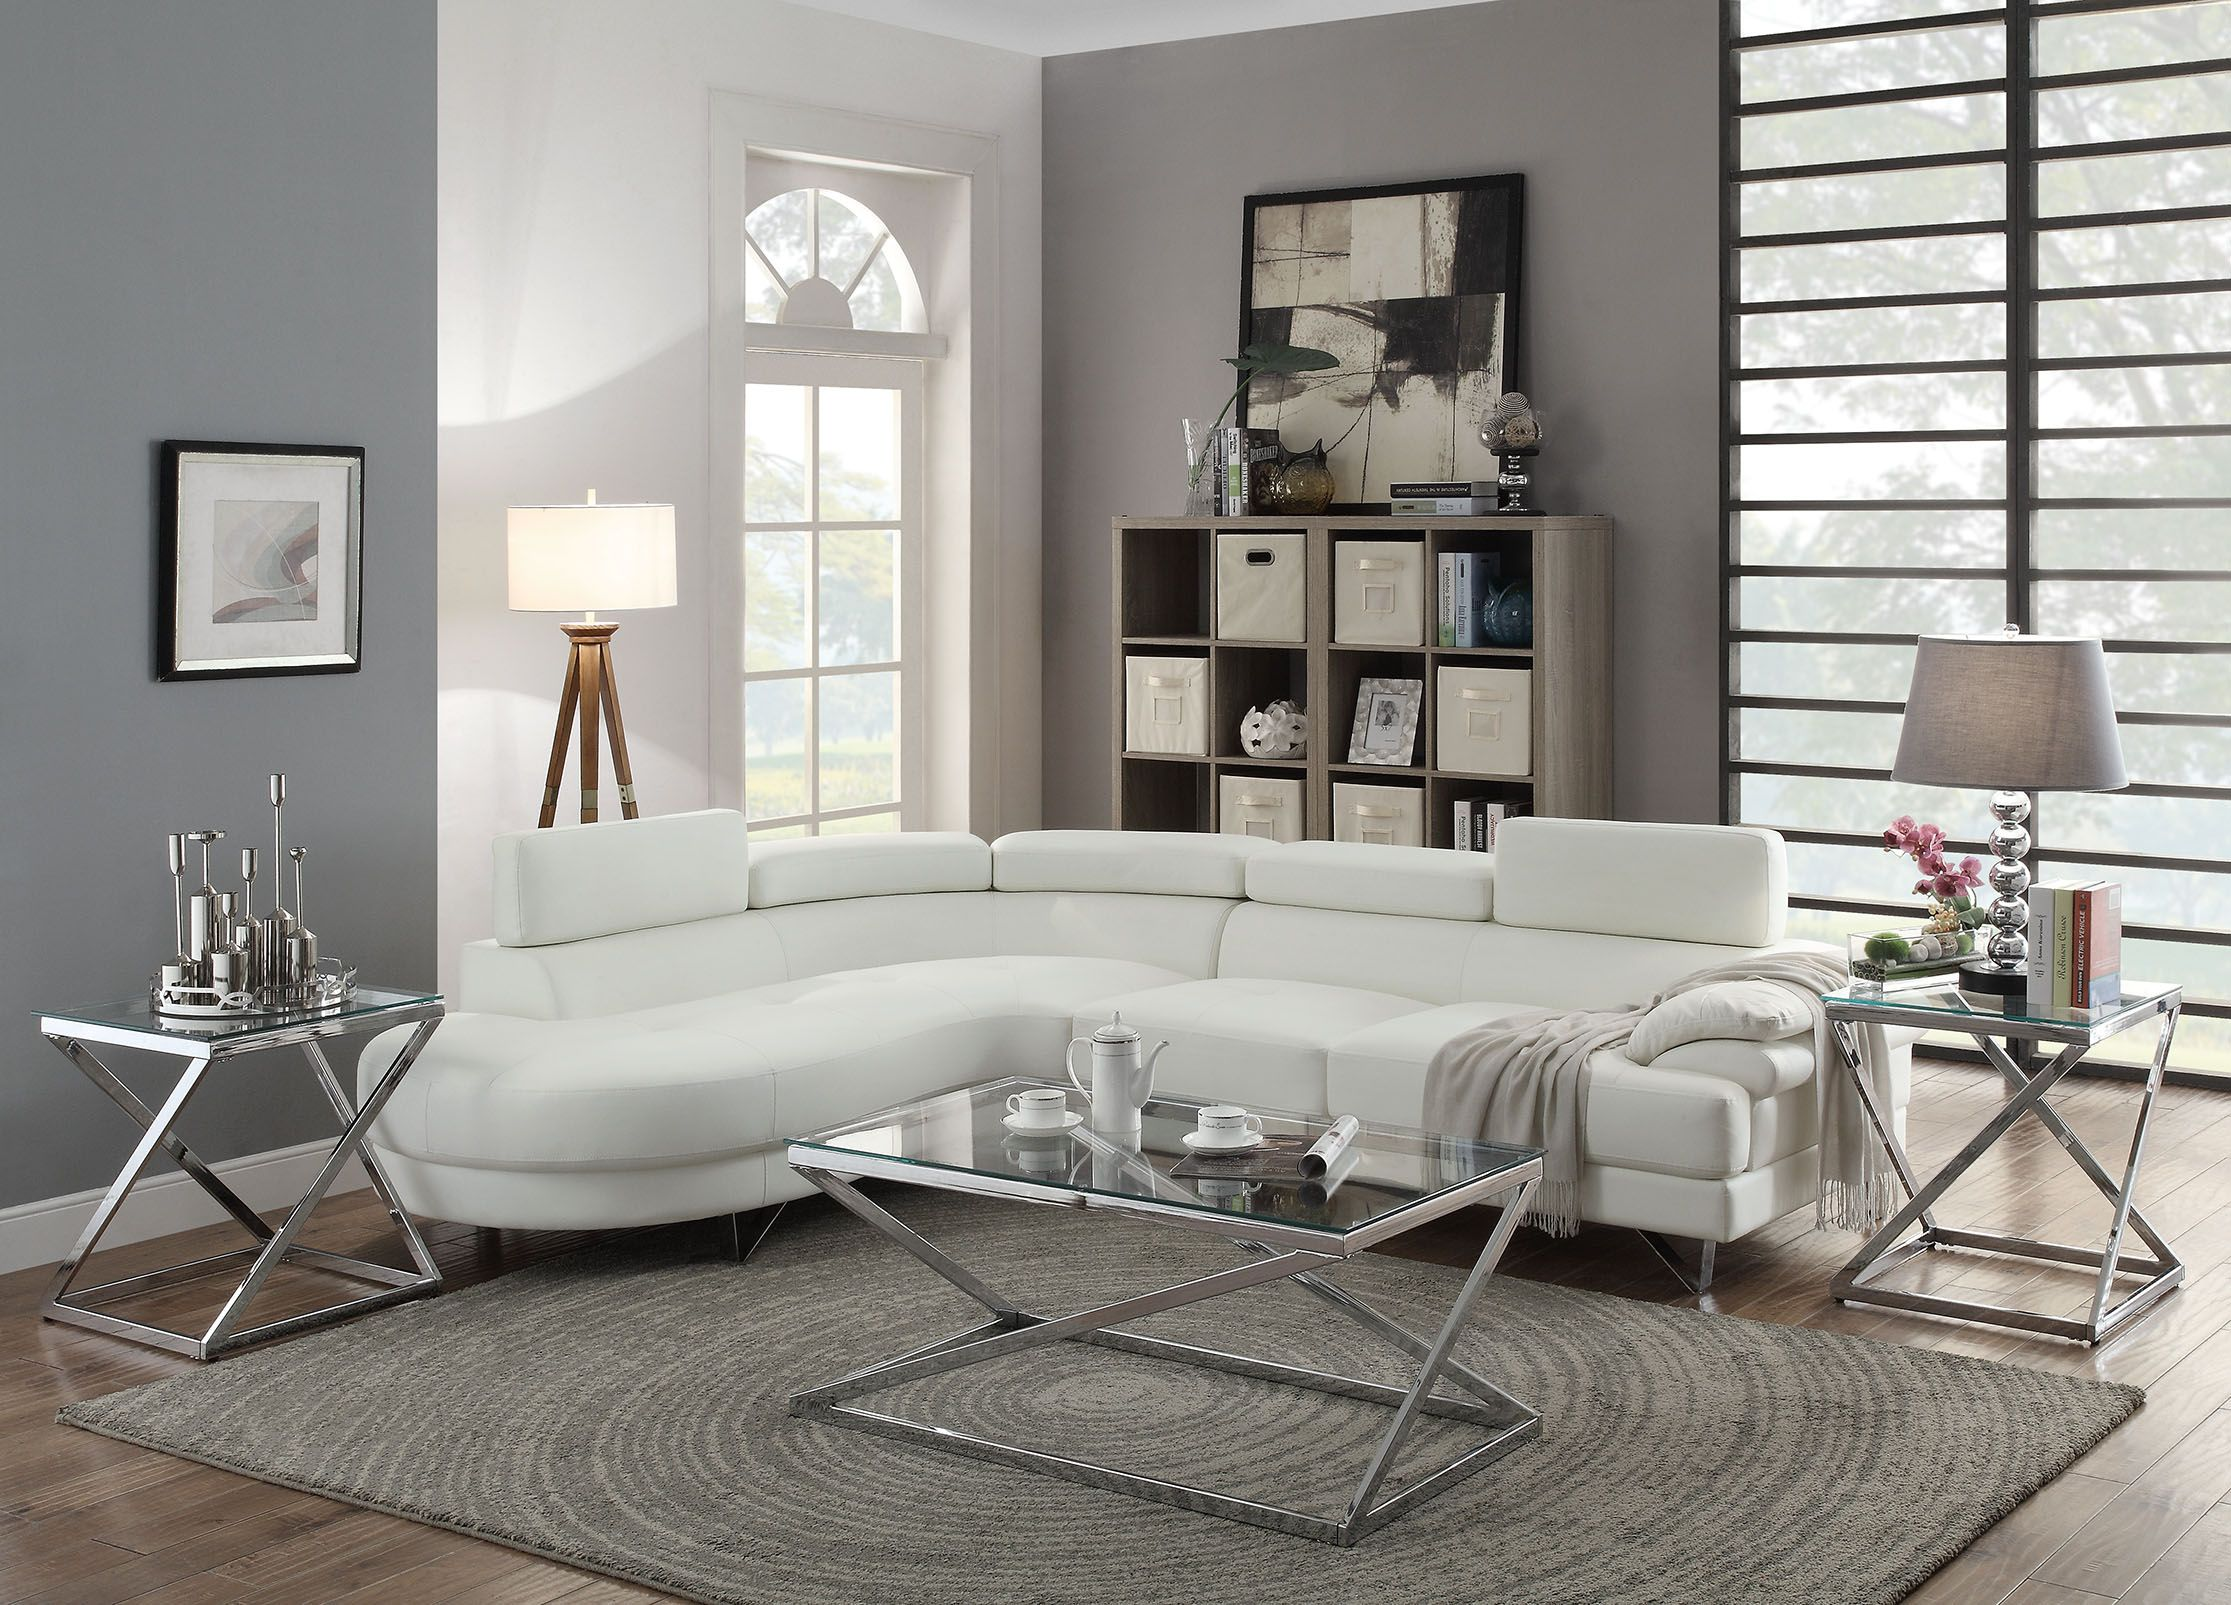 2pc Bobkona Sectional Sofa